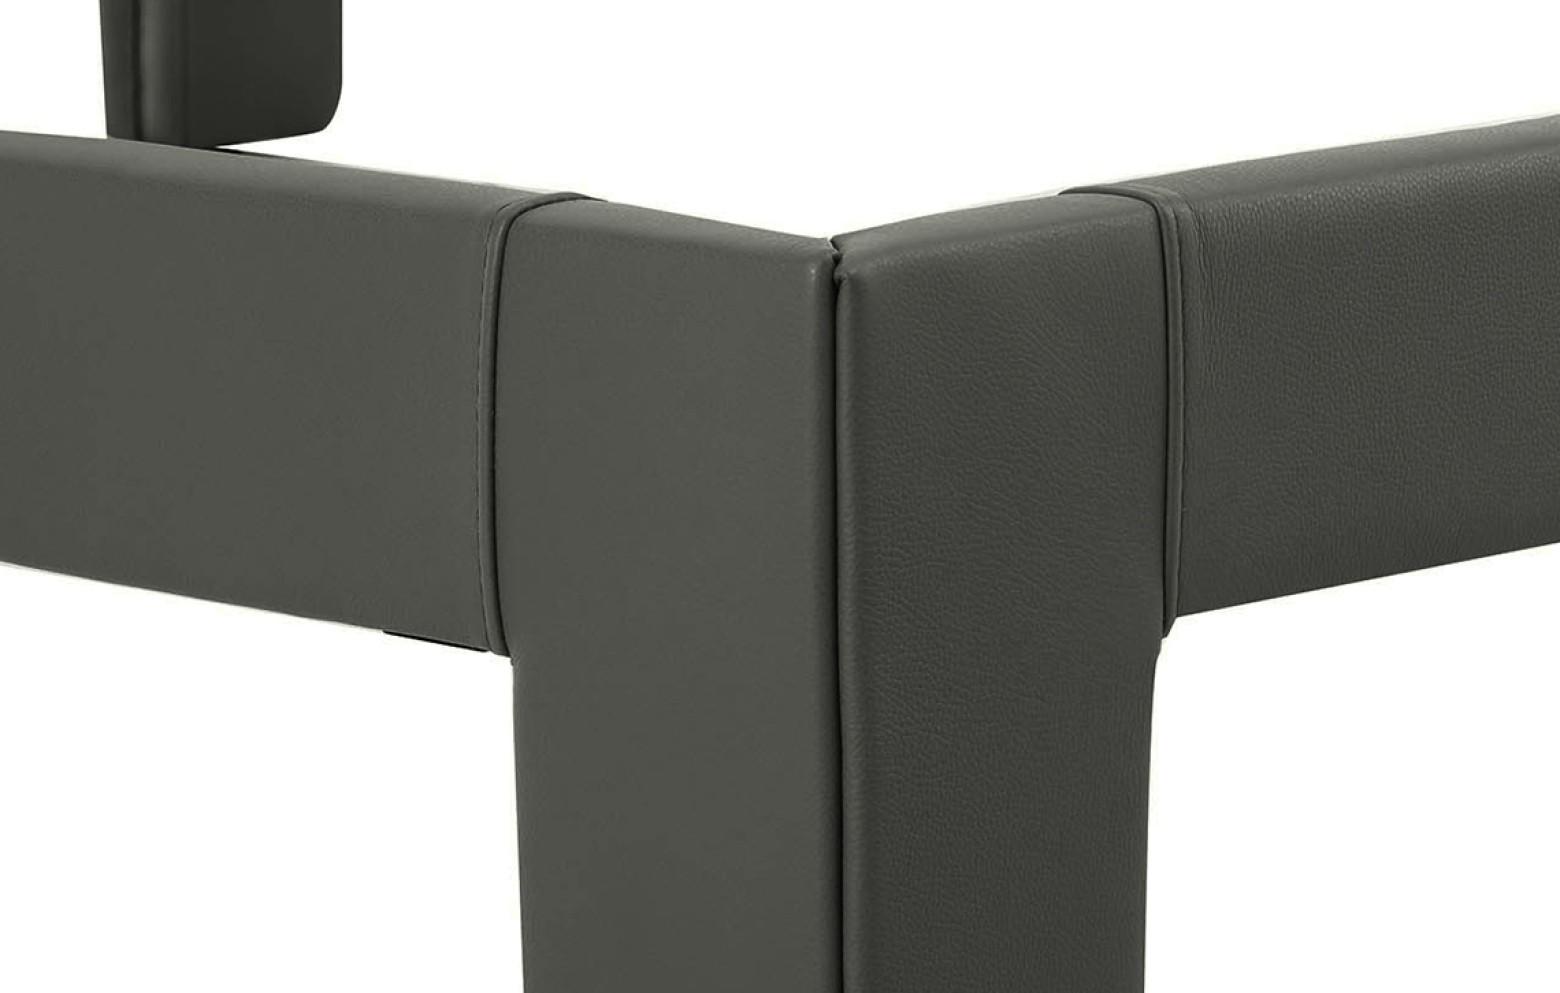 hanna betten betten schr nke who 39 s perfect. Black Bedroom Furniture Sets. Home Design Ideas